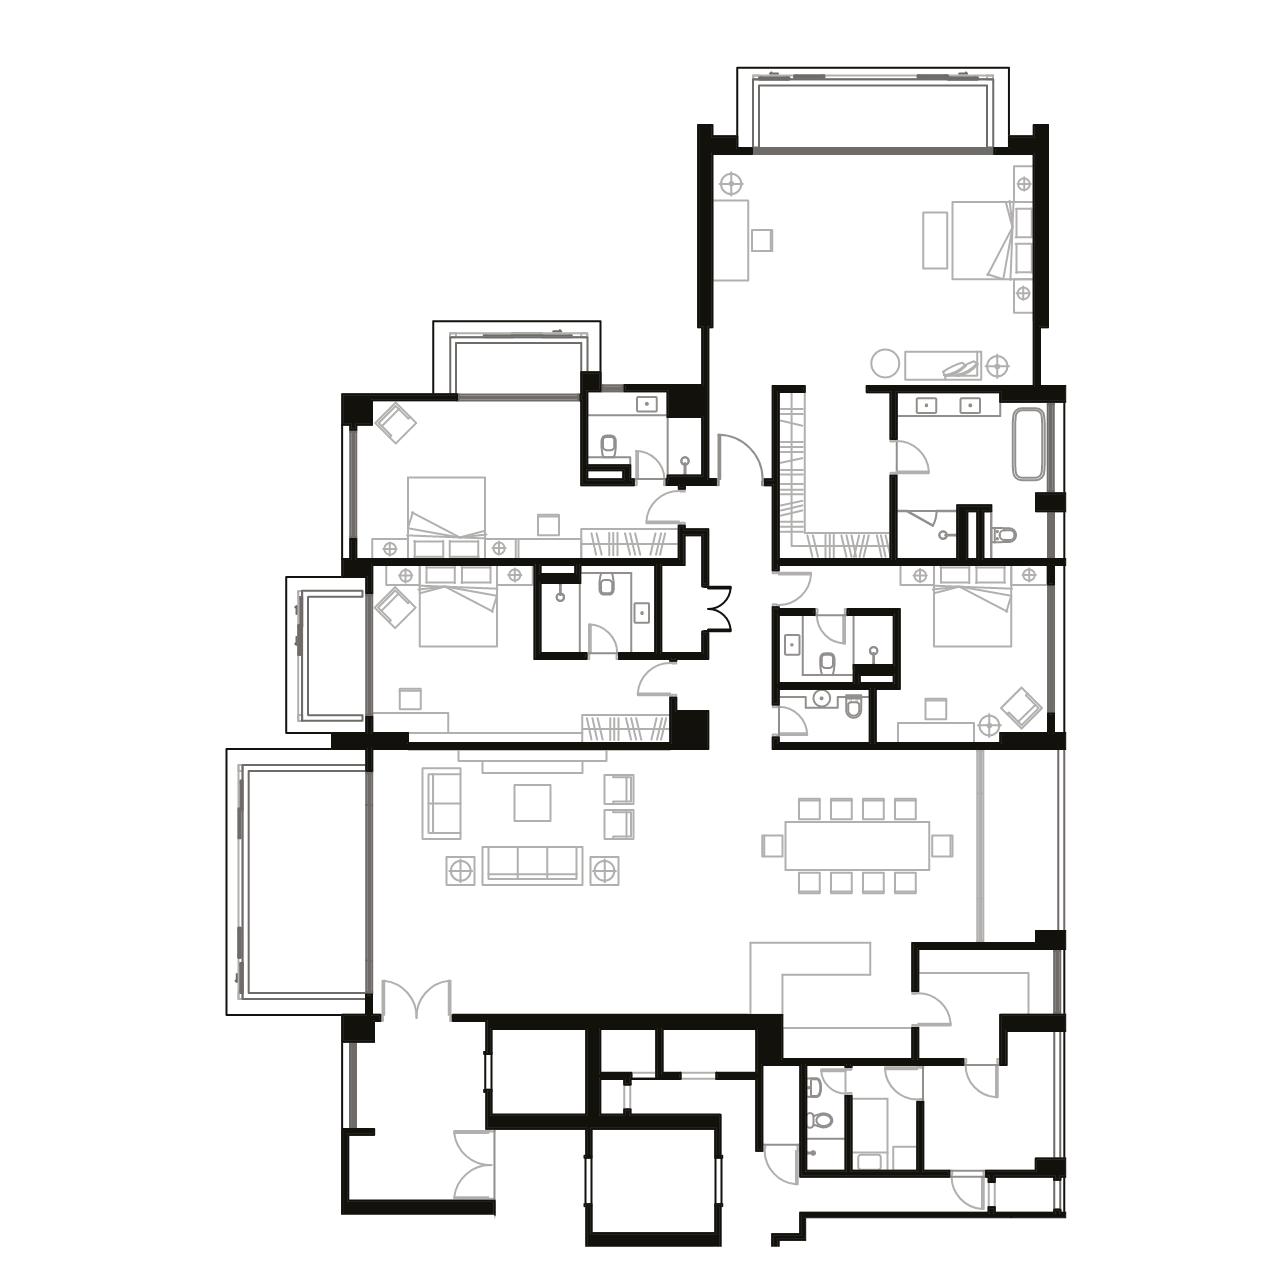 Ampang Condominium Floor Plan B2